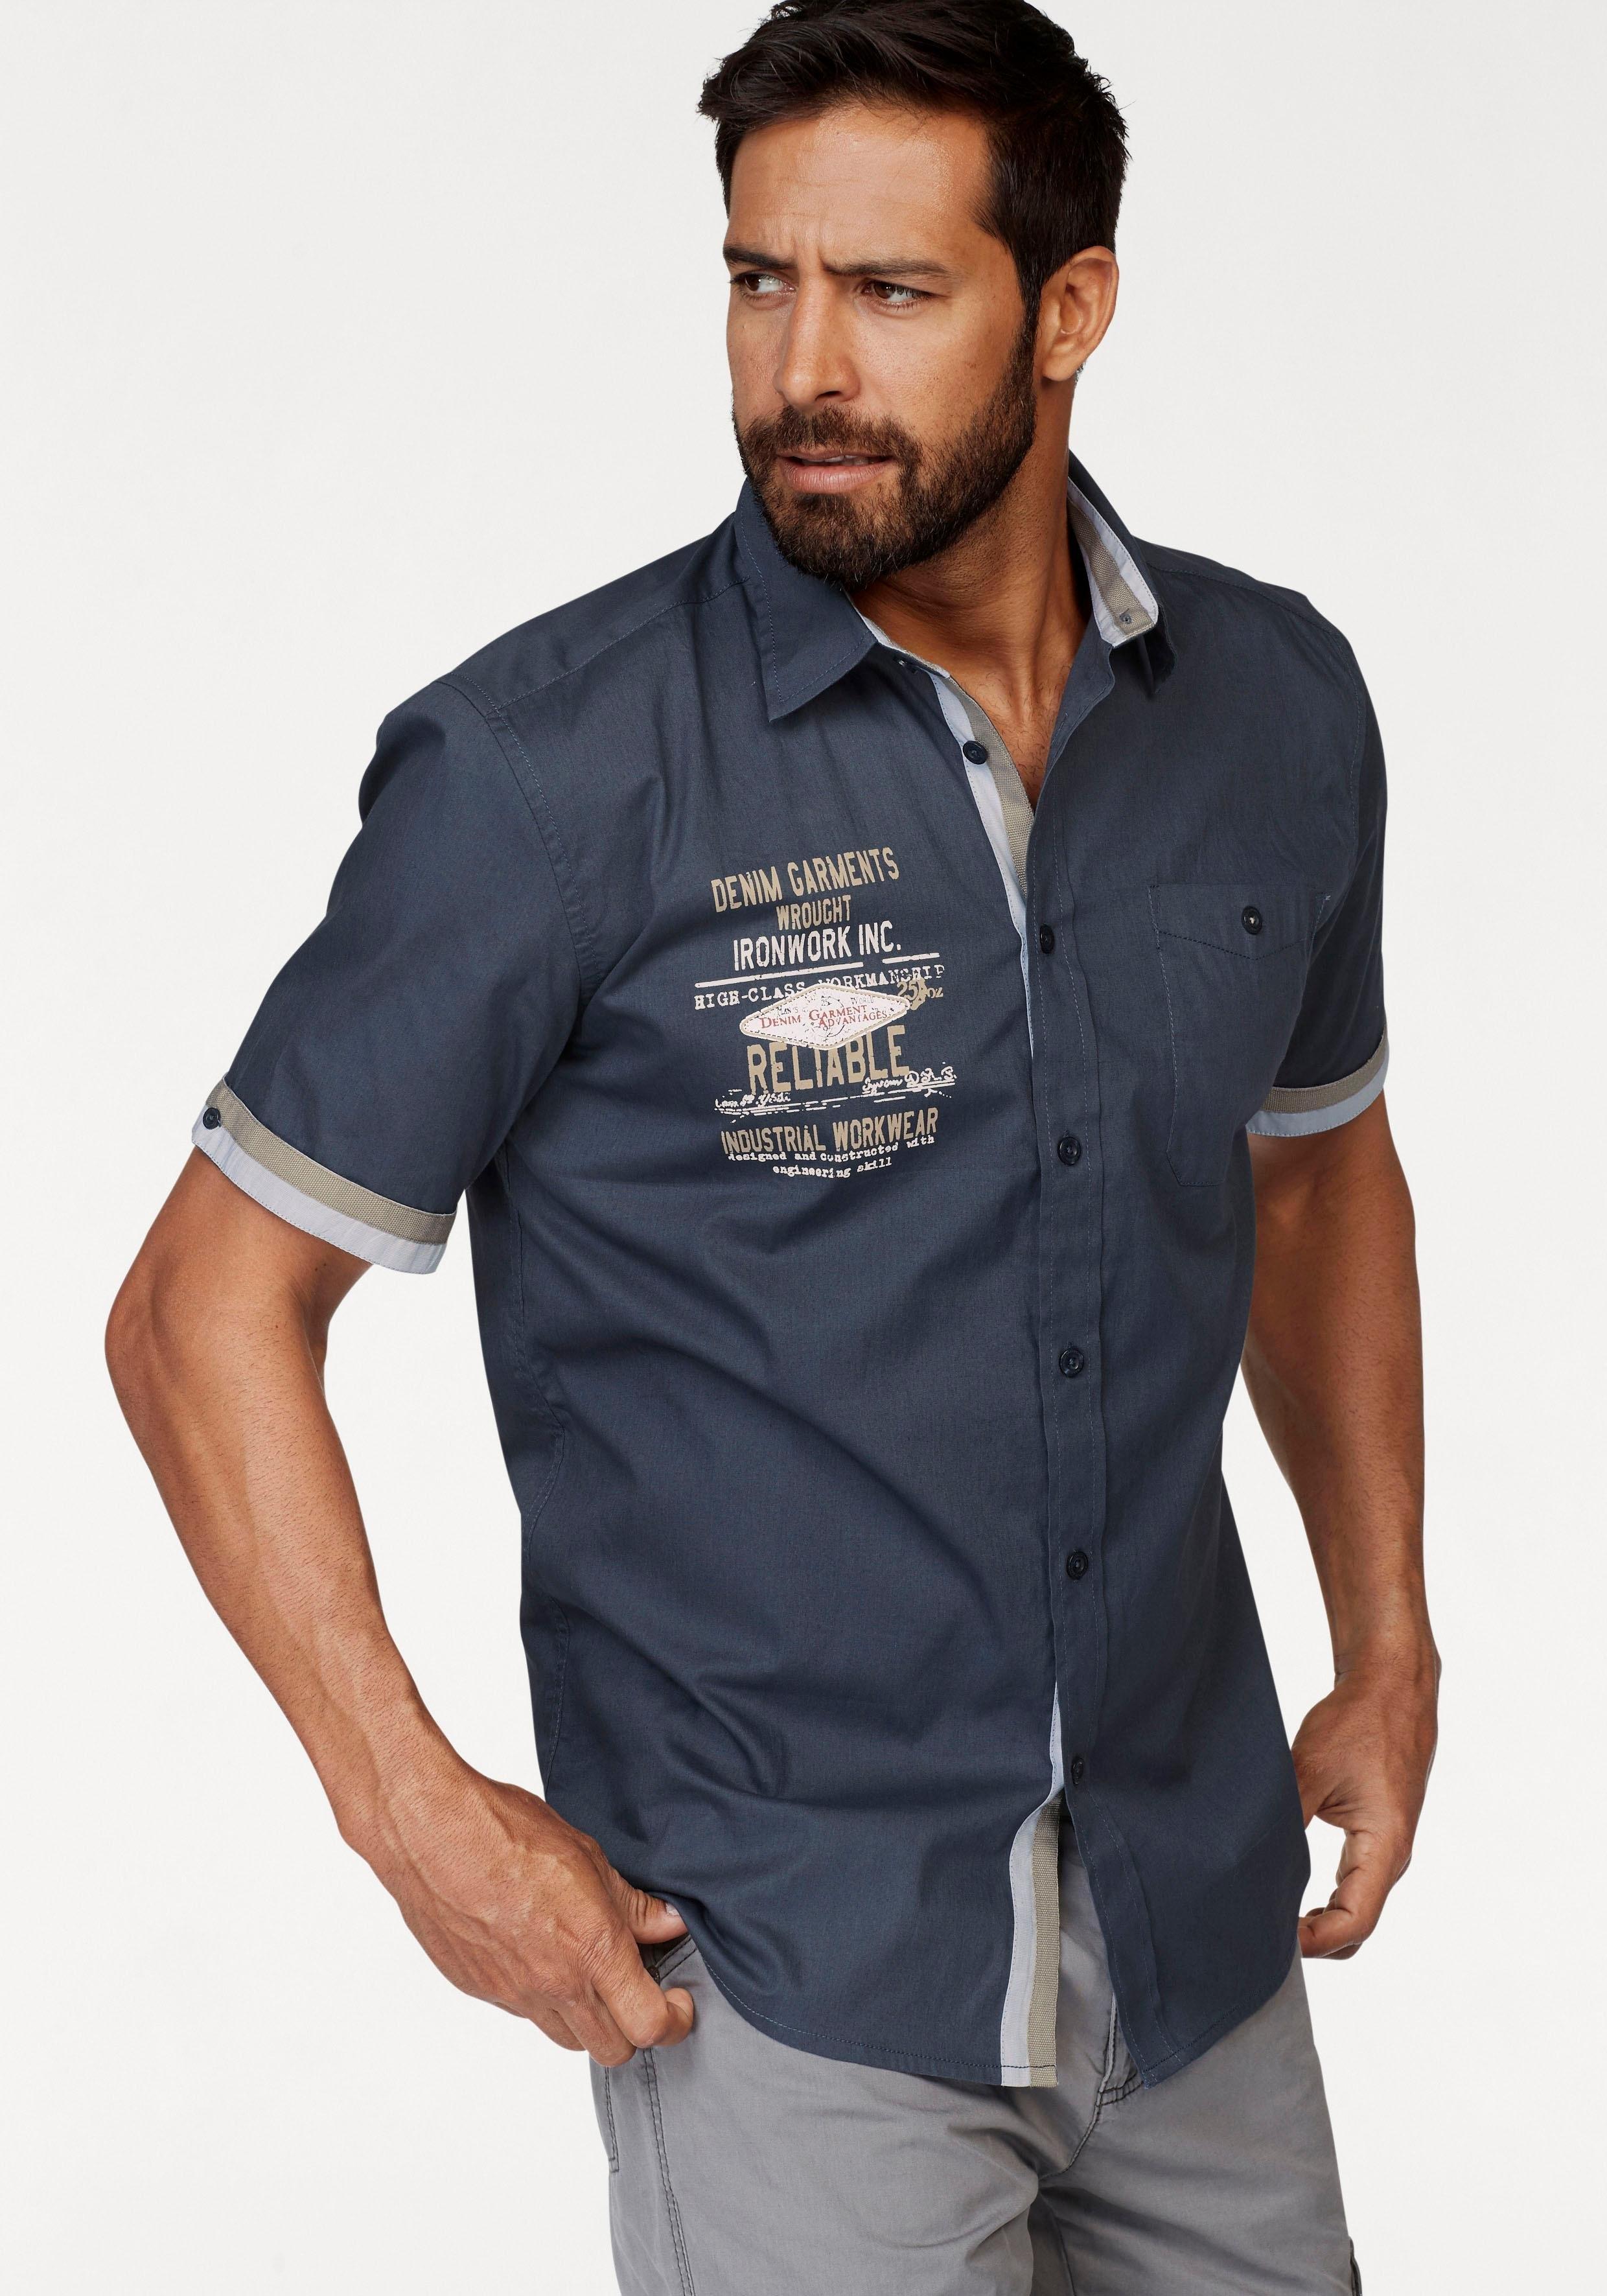 Korte Mouw Overhemd Mannen.Man S World Overhemd Met Korte Mouwen Makkelijk Gekocht Otto